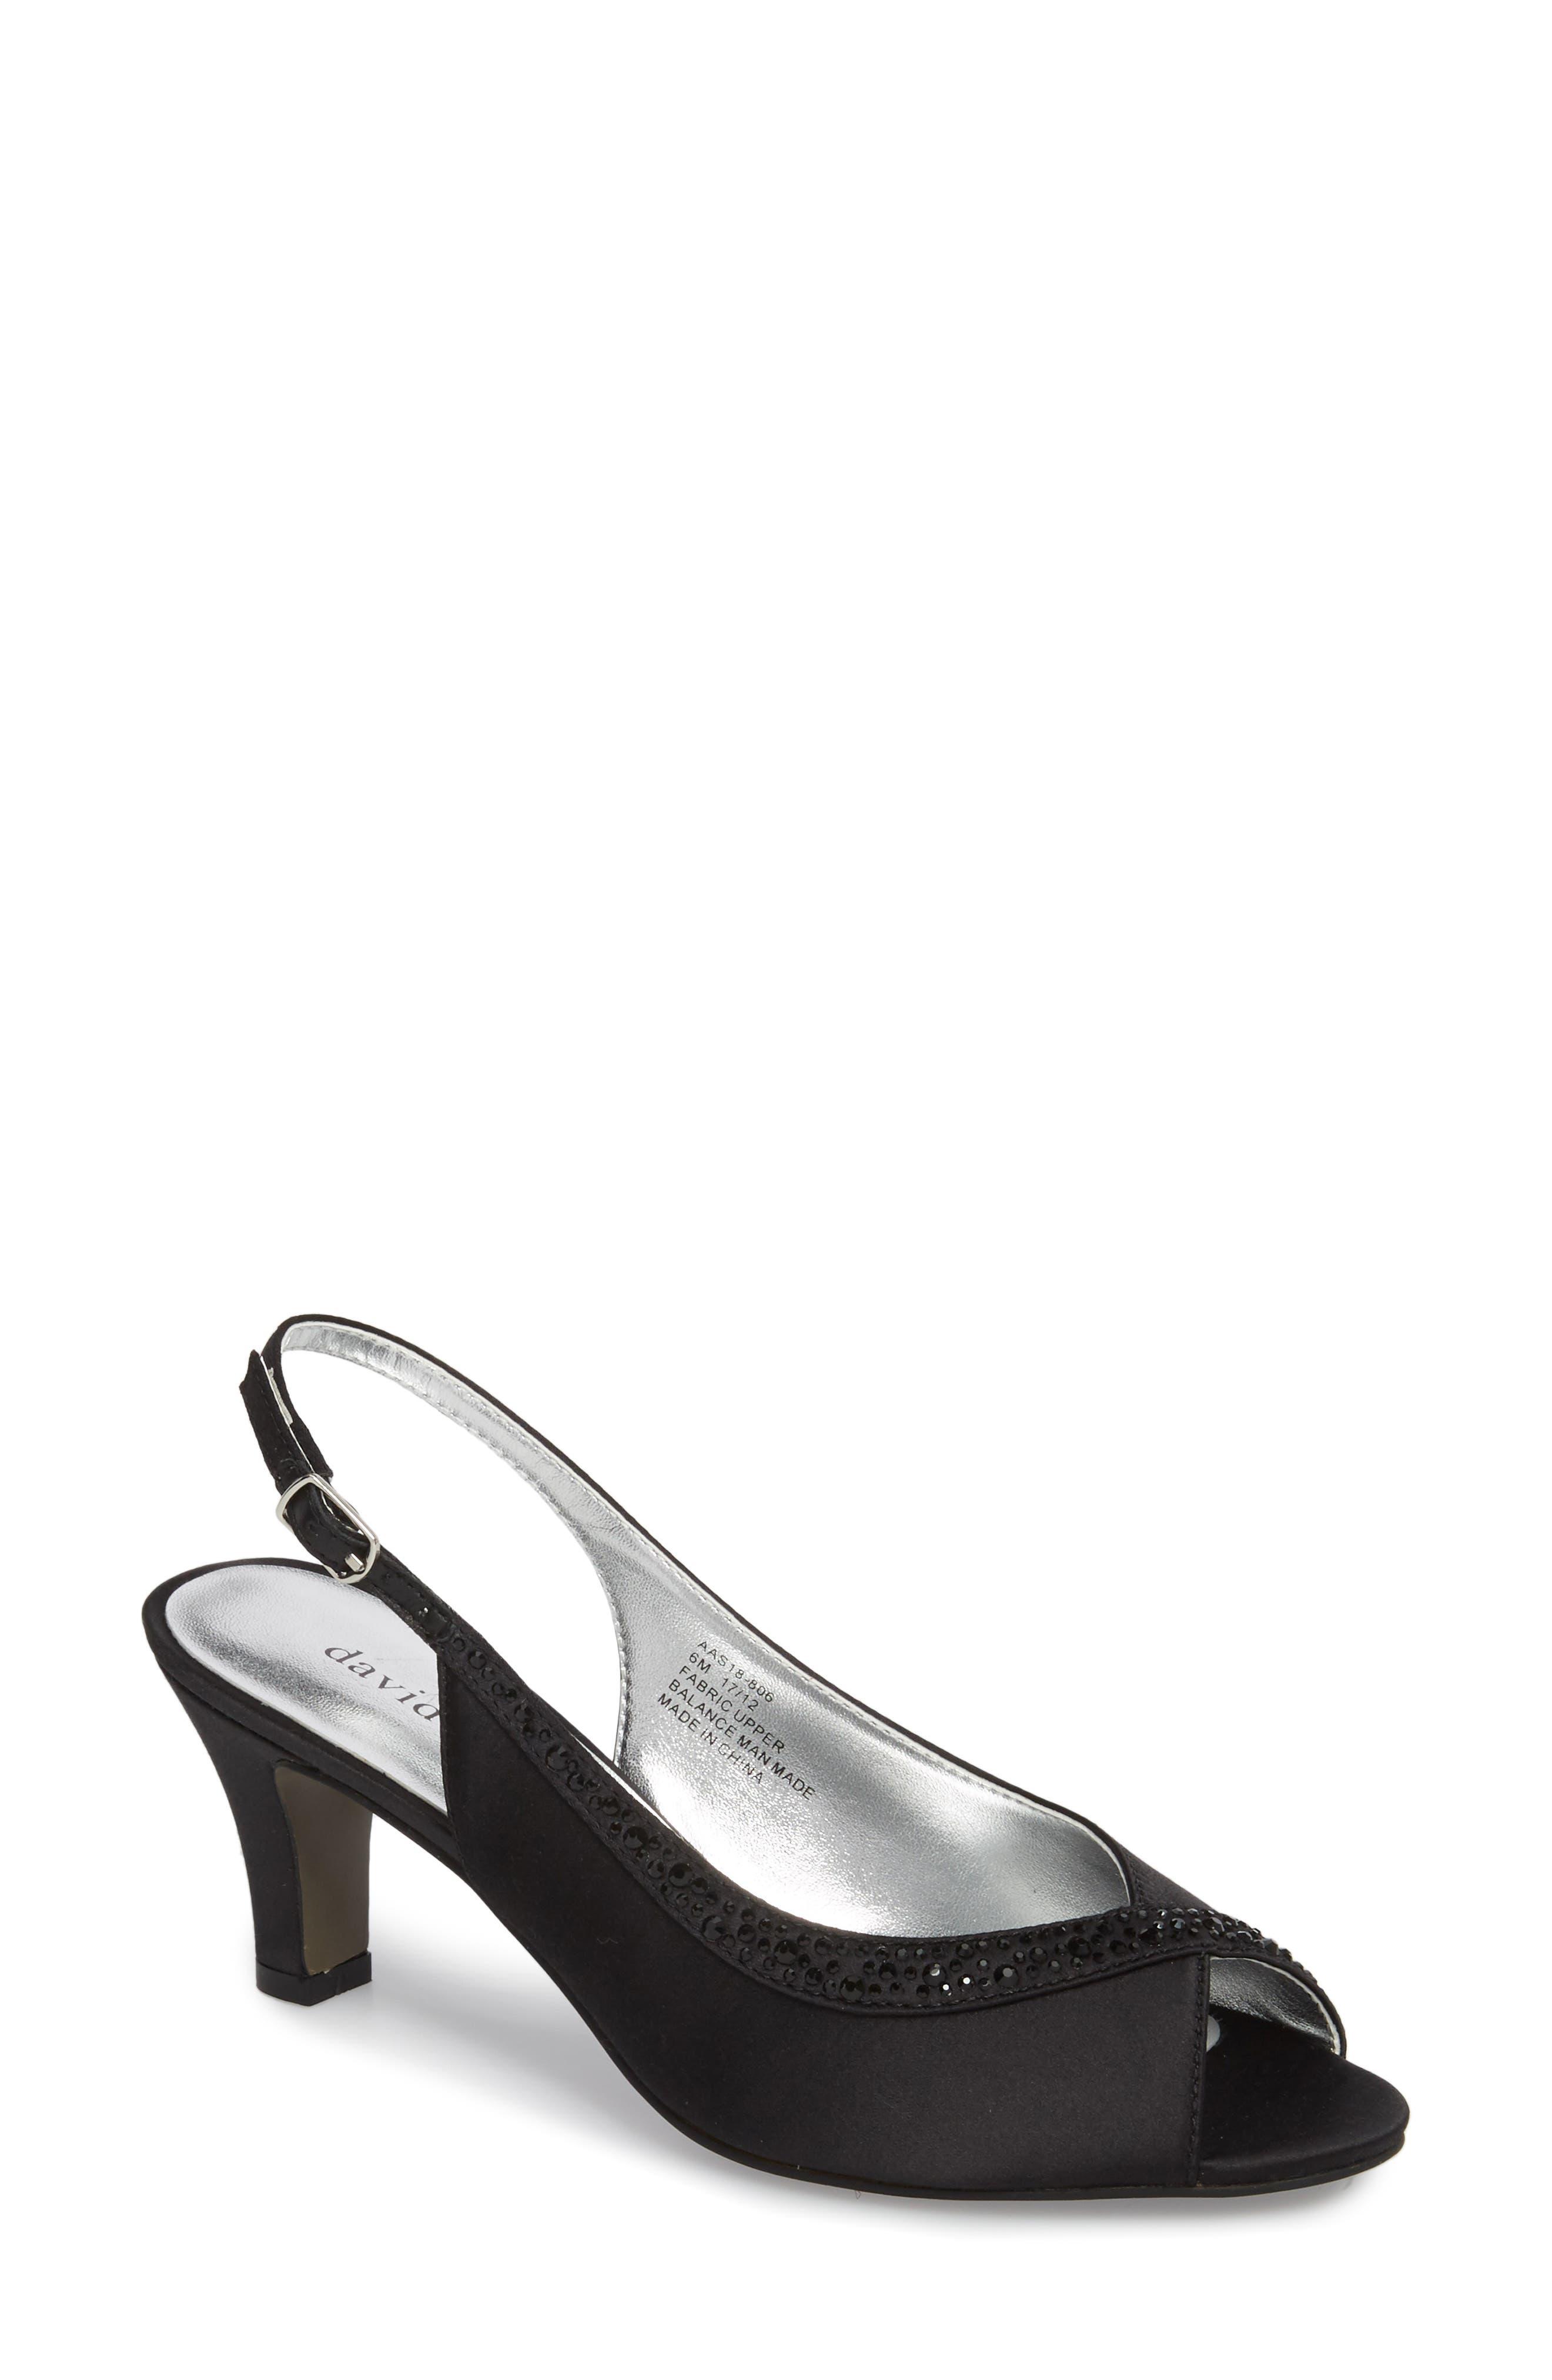 DAVID TATE Dainty Slingback Sandal, Main, color, BLACK SATIN